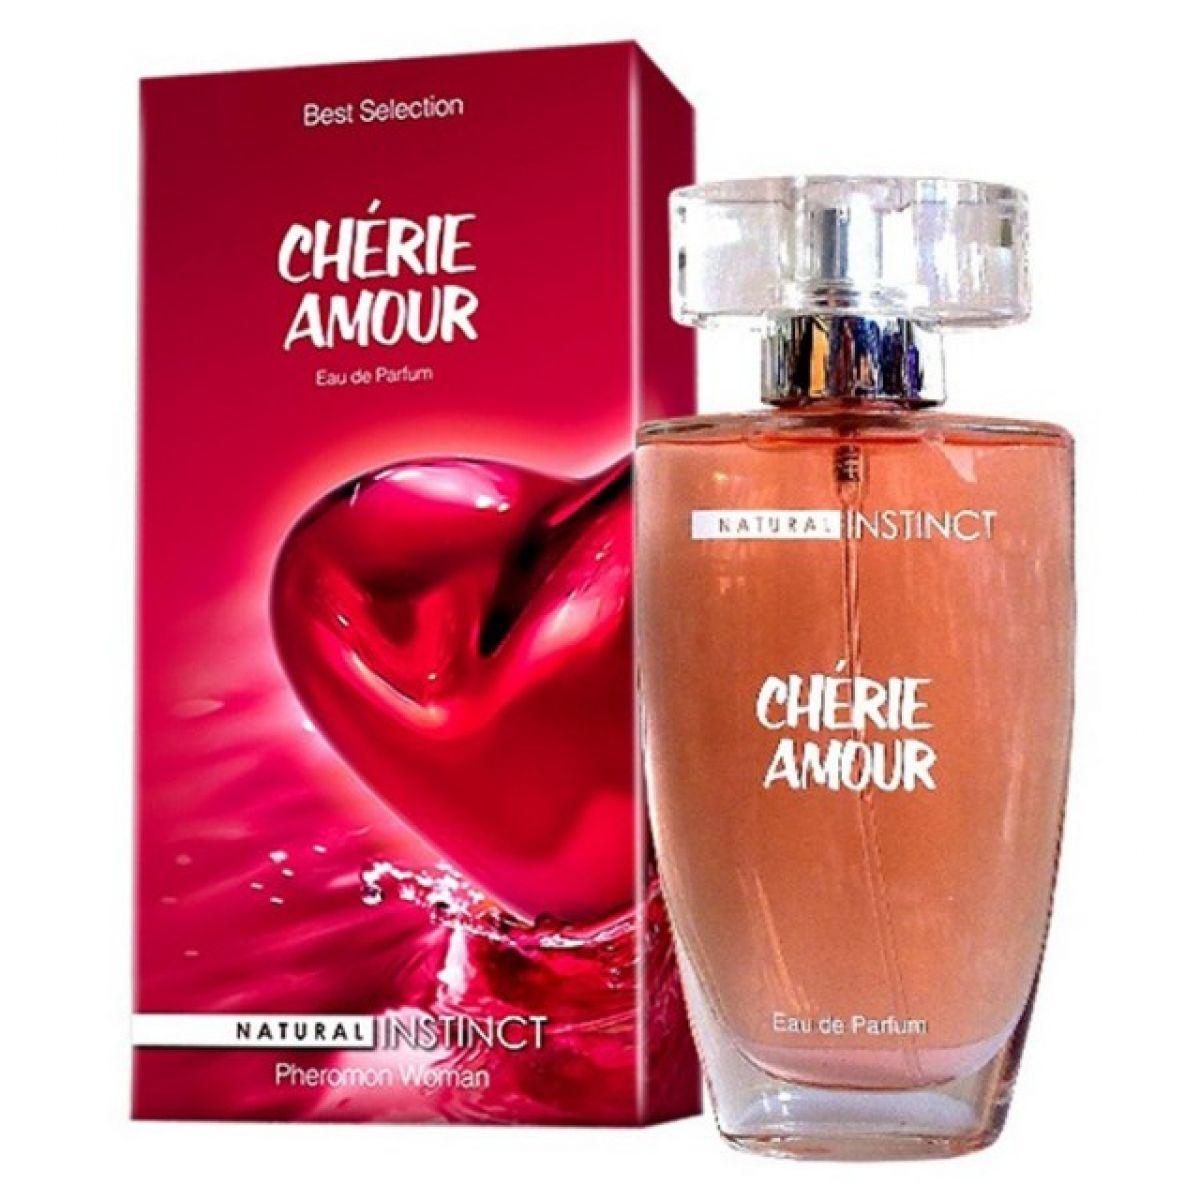 Духи с феромонами Cherie Amour Natural Instinct 50 мл женские